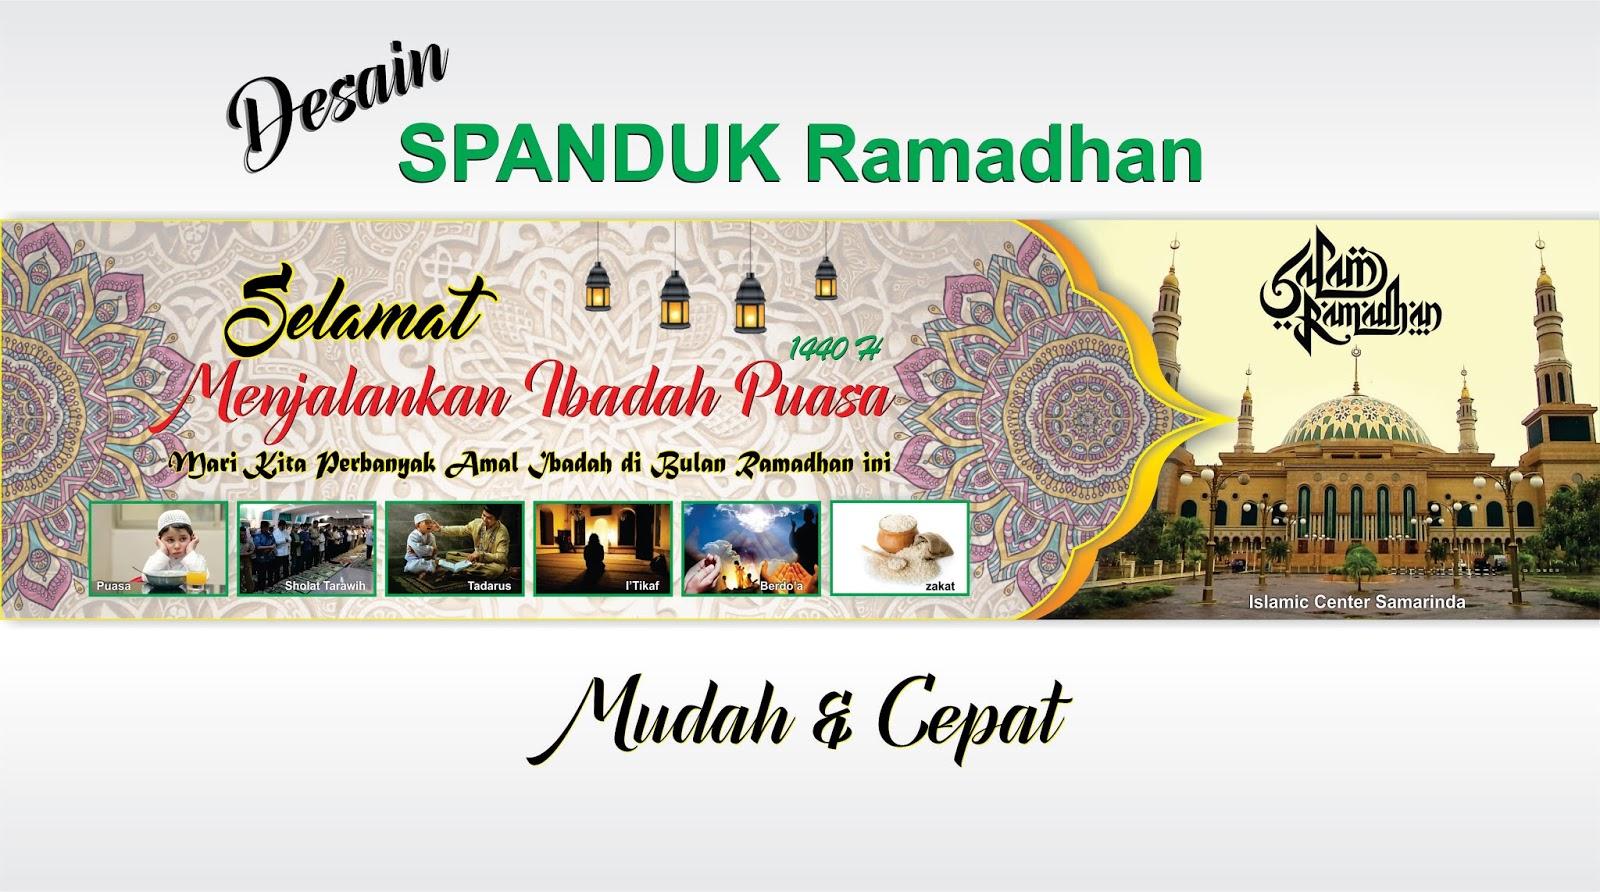 Spanduk Ucapan Ramadhan 2019 - Nusagates